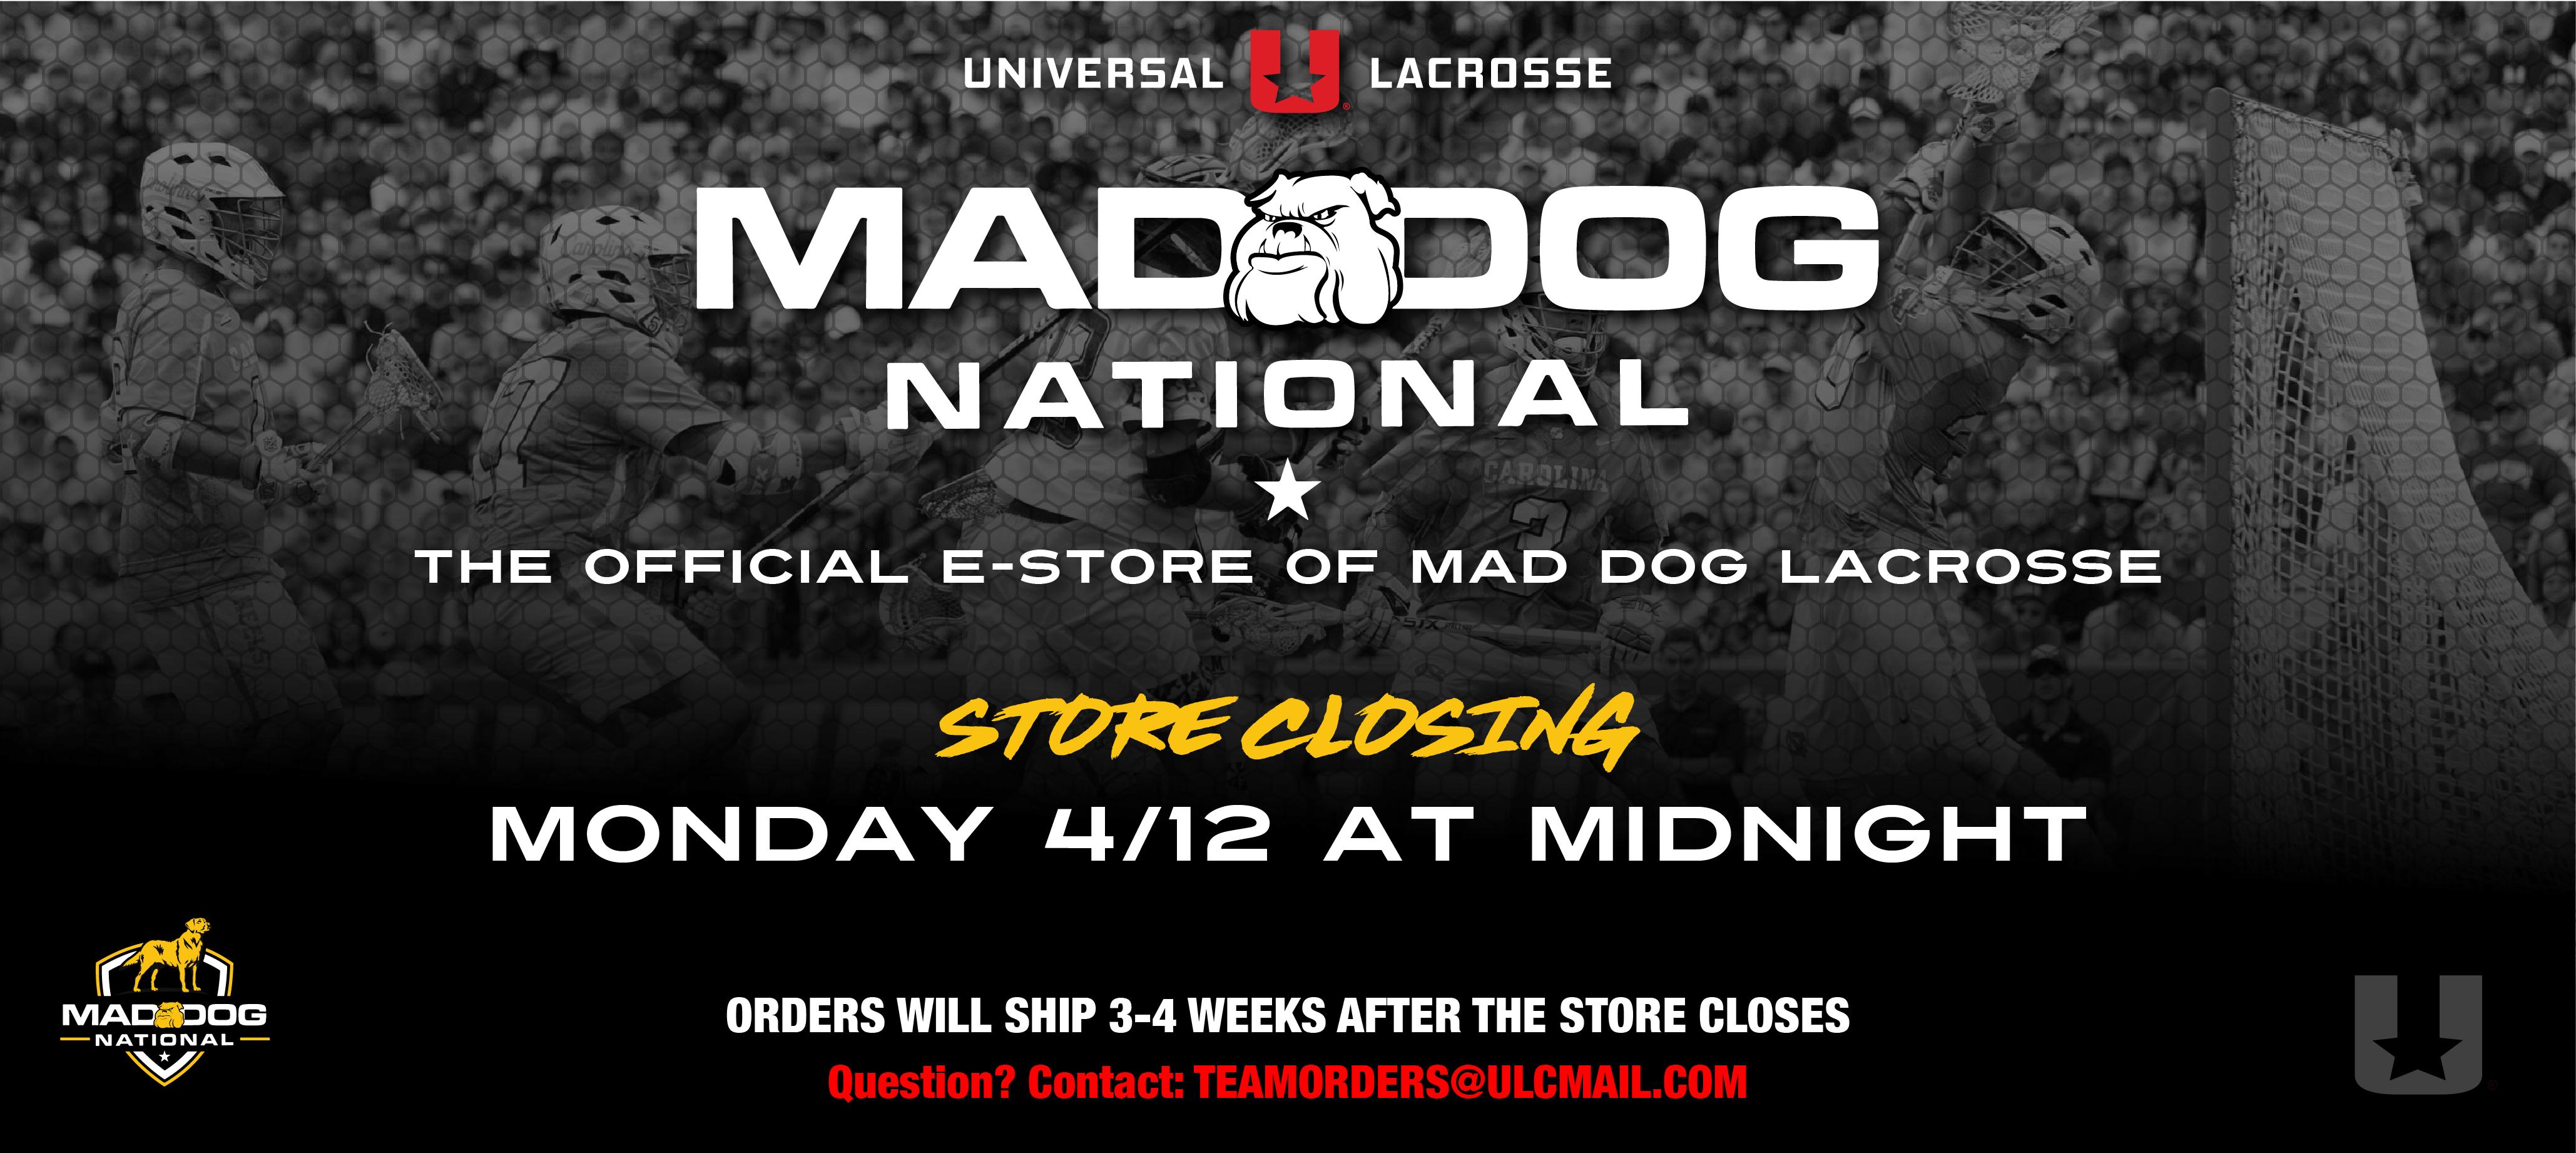 Mad Dog National